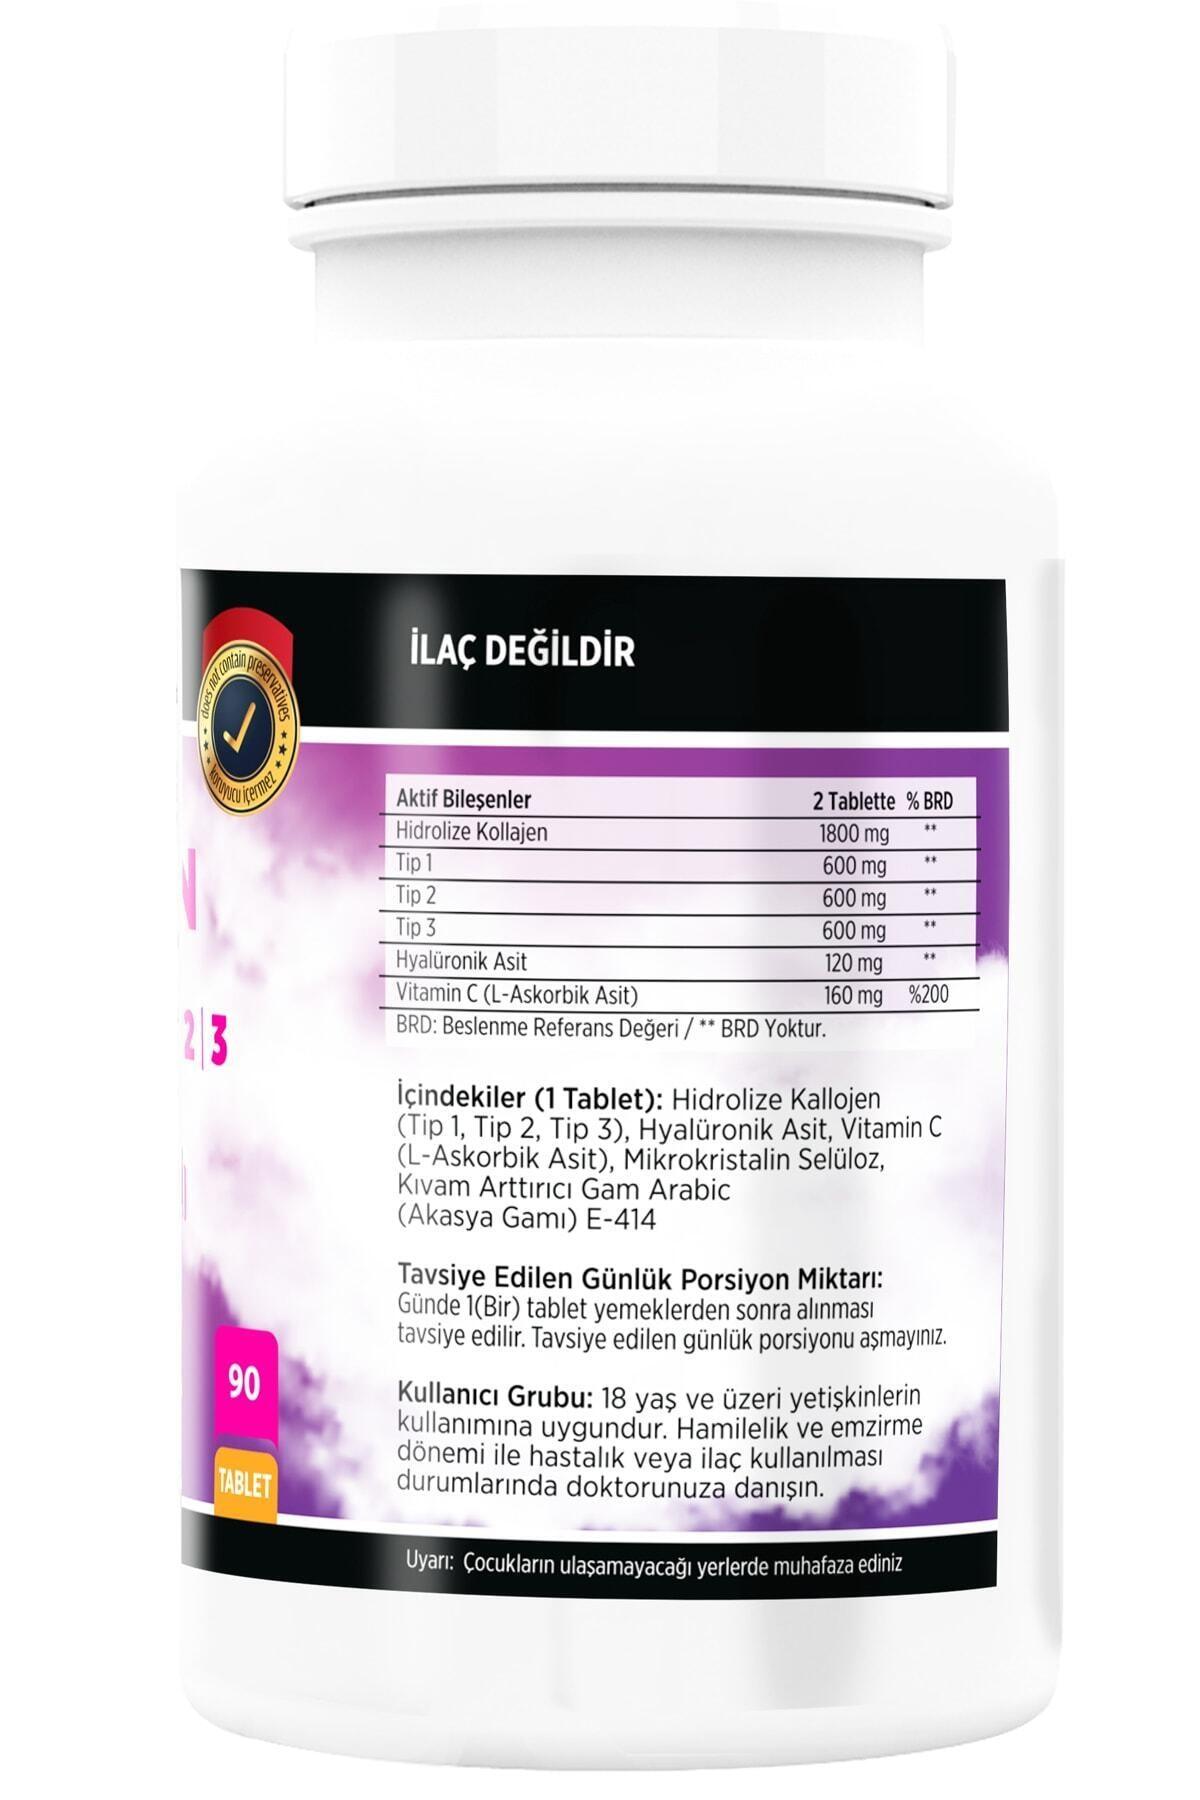 FLX Kollajen Tip-1 Tip-2 Tip-3 Hyaluronic Asit Vitamin C 90 Tablet Collagen 2